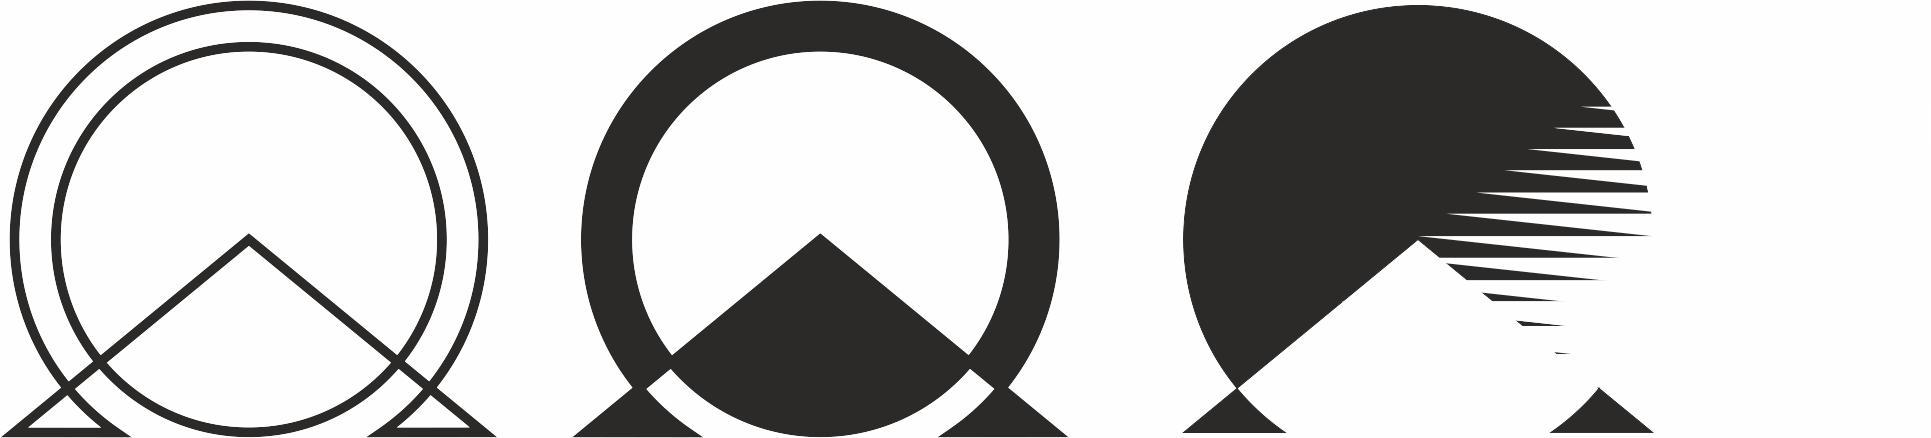 Придумать концепцию логотипа группы компаний фото f_0105b75952e5ca88.jpg